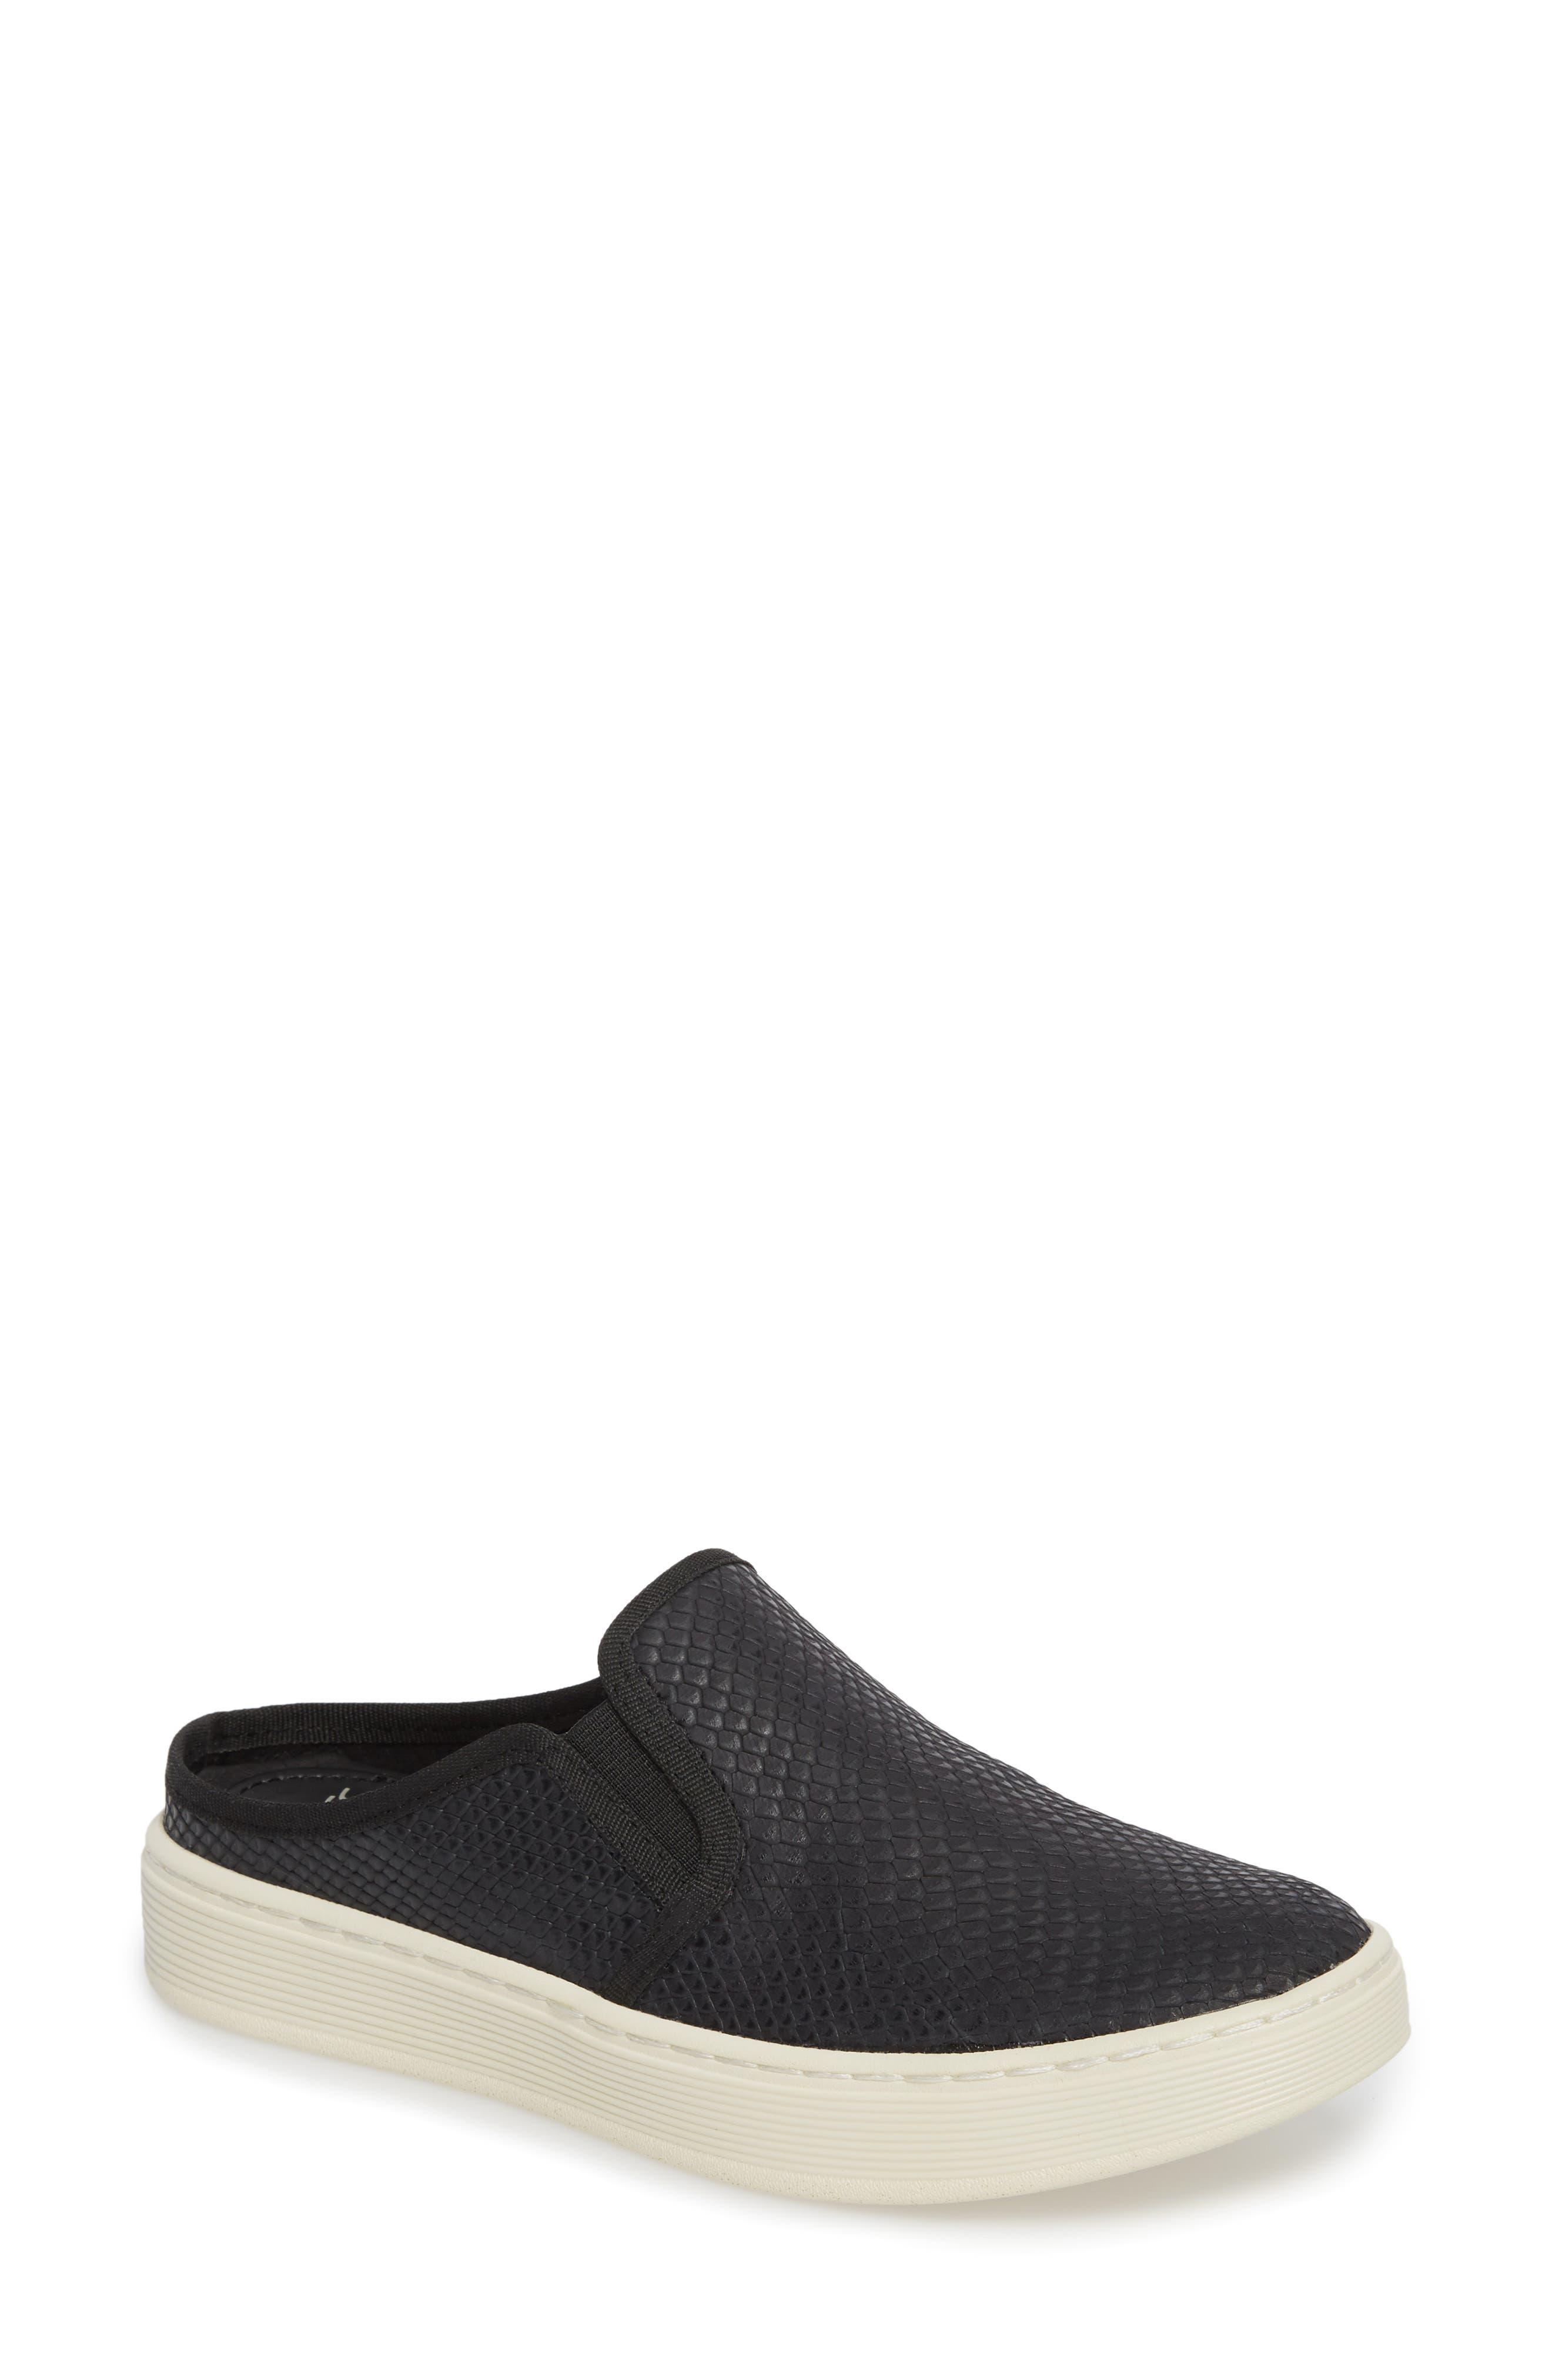 Somers Slip-On Sneaker,                         Main,                         color, 001